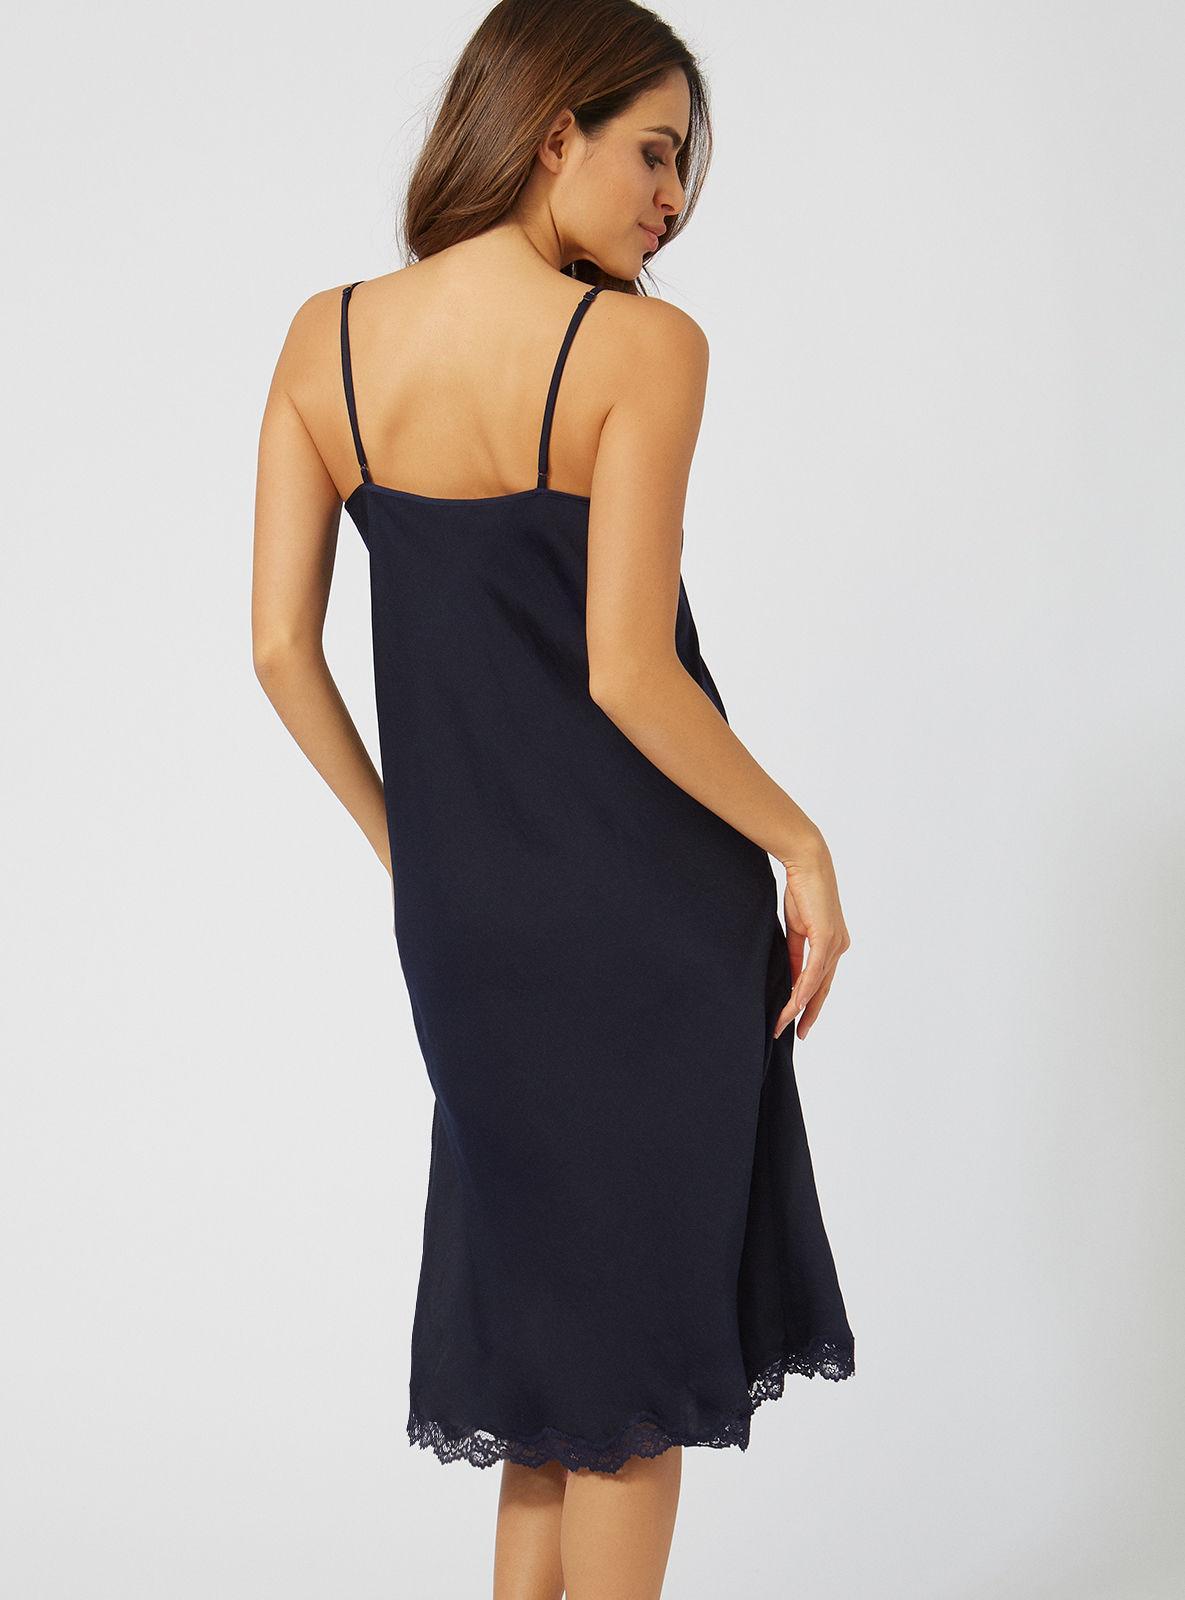 55171d9229 Boux Avenue - Blue Selena Midi Chemise - Lyst. View fullscreen